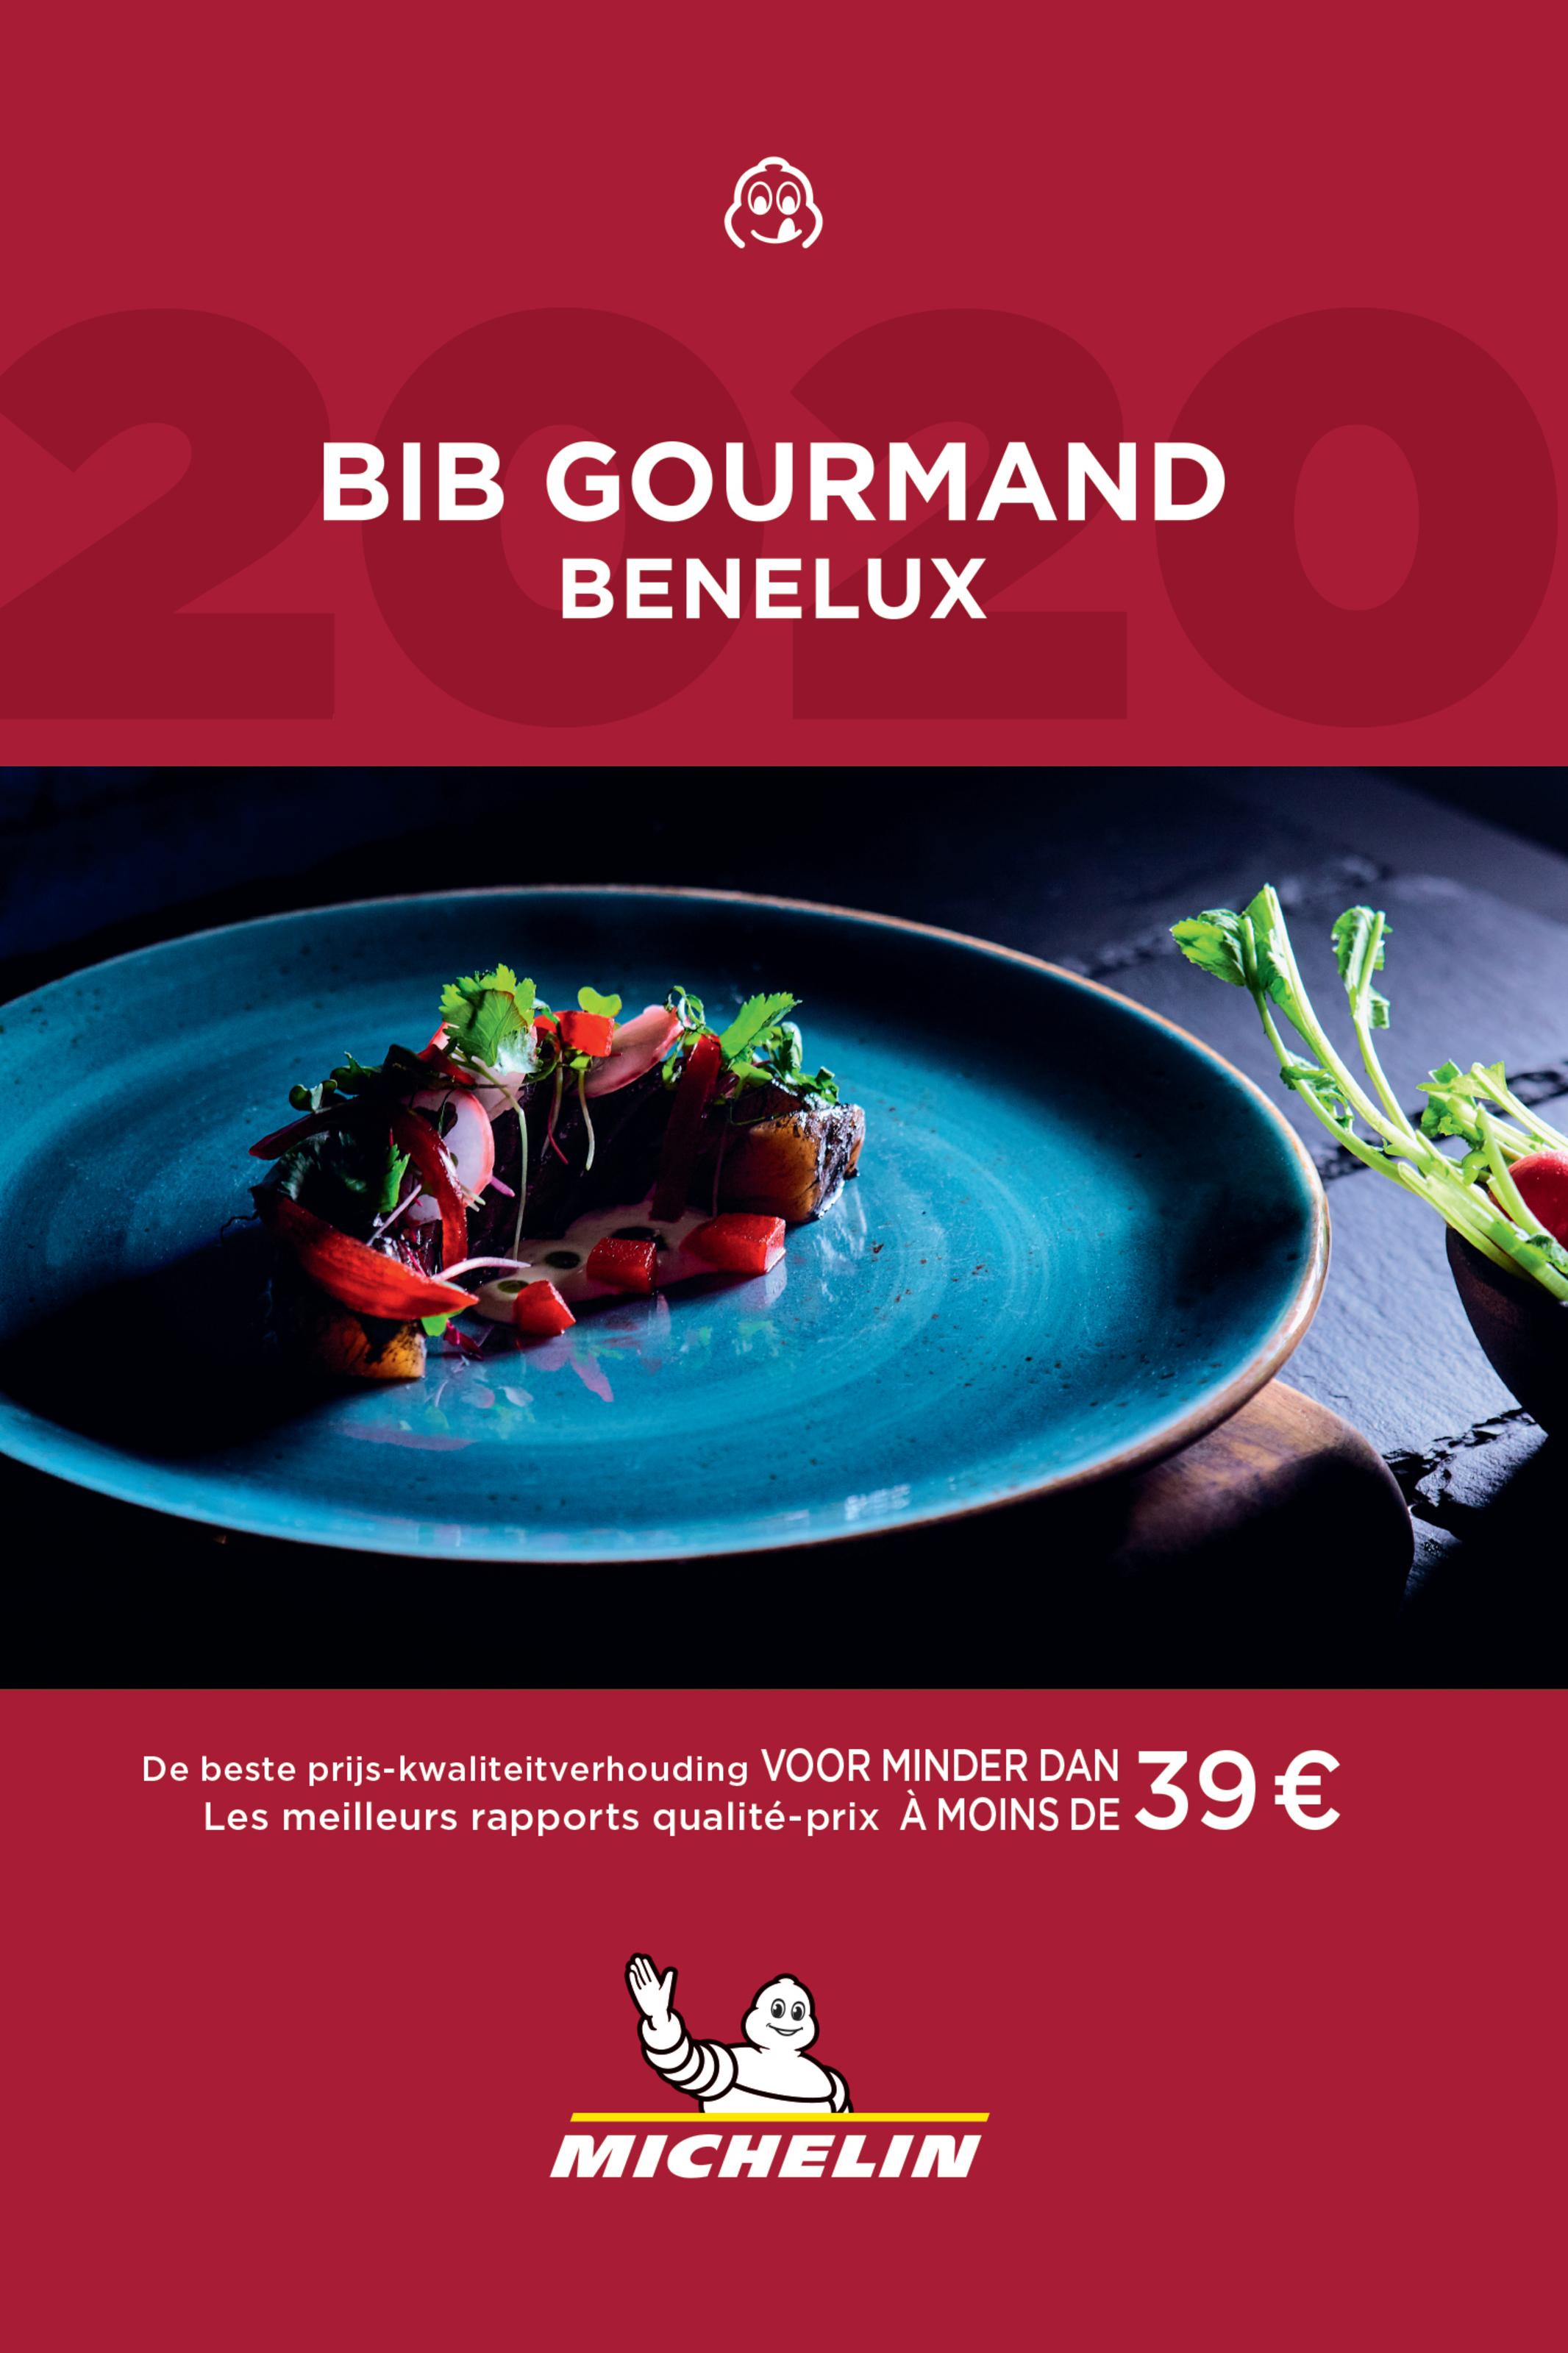 *BIB GOURMAND BENELUX 2020